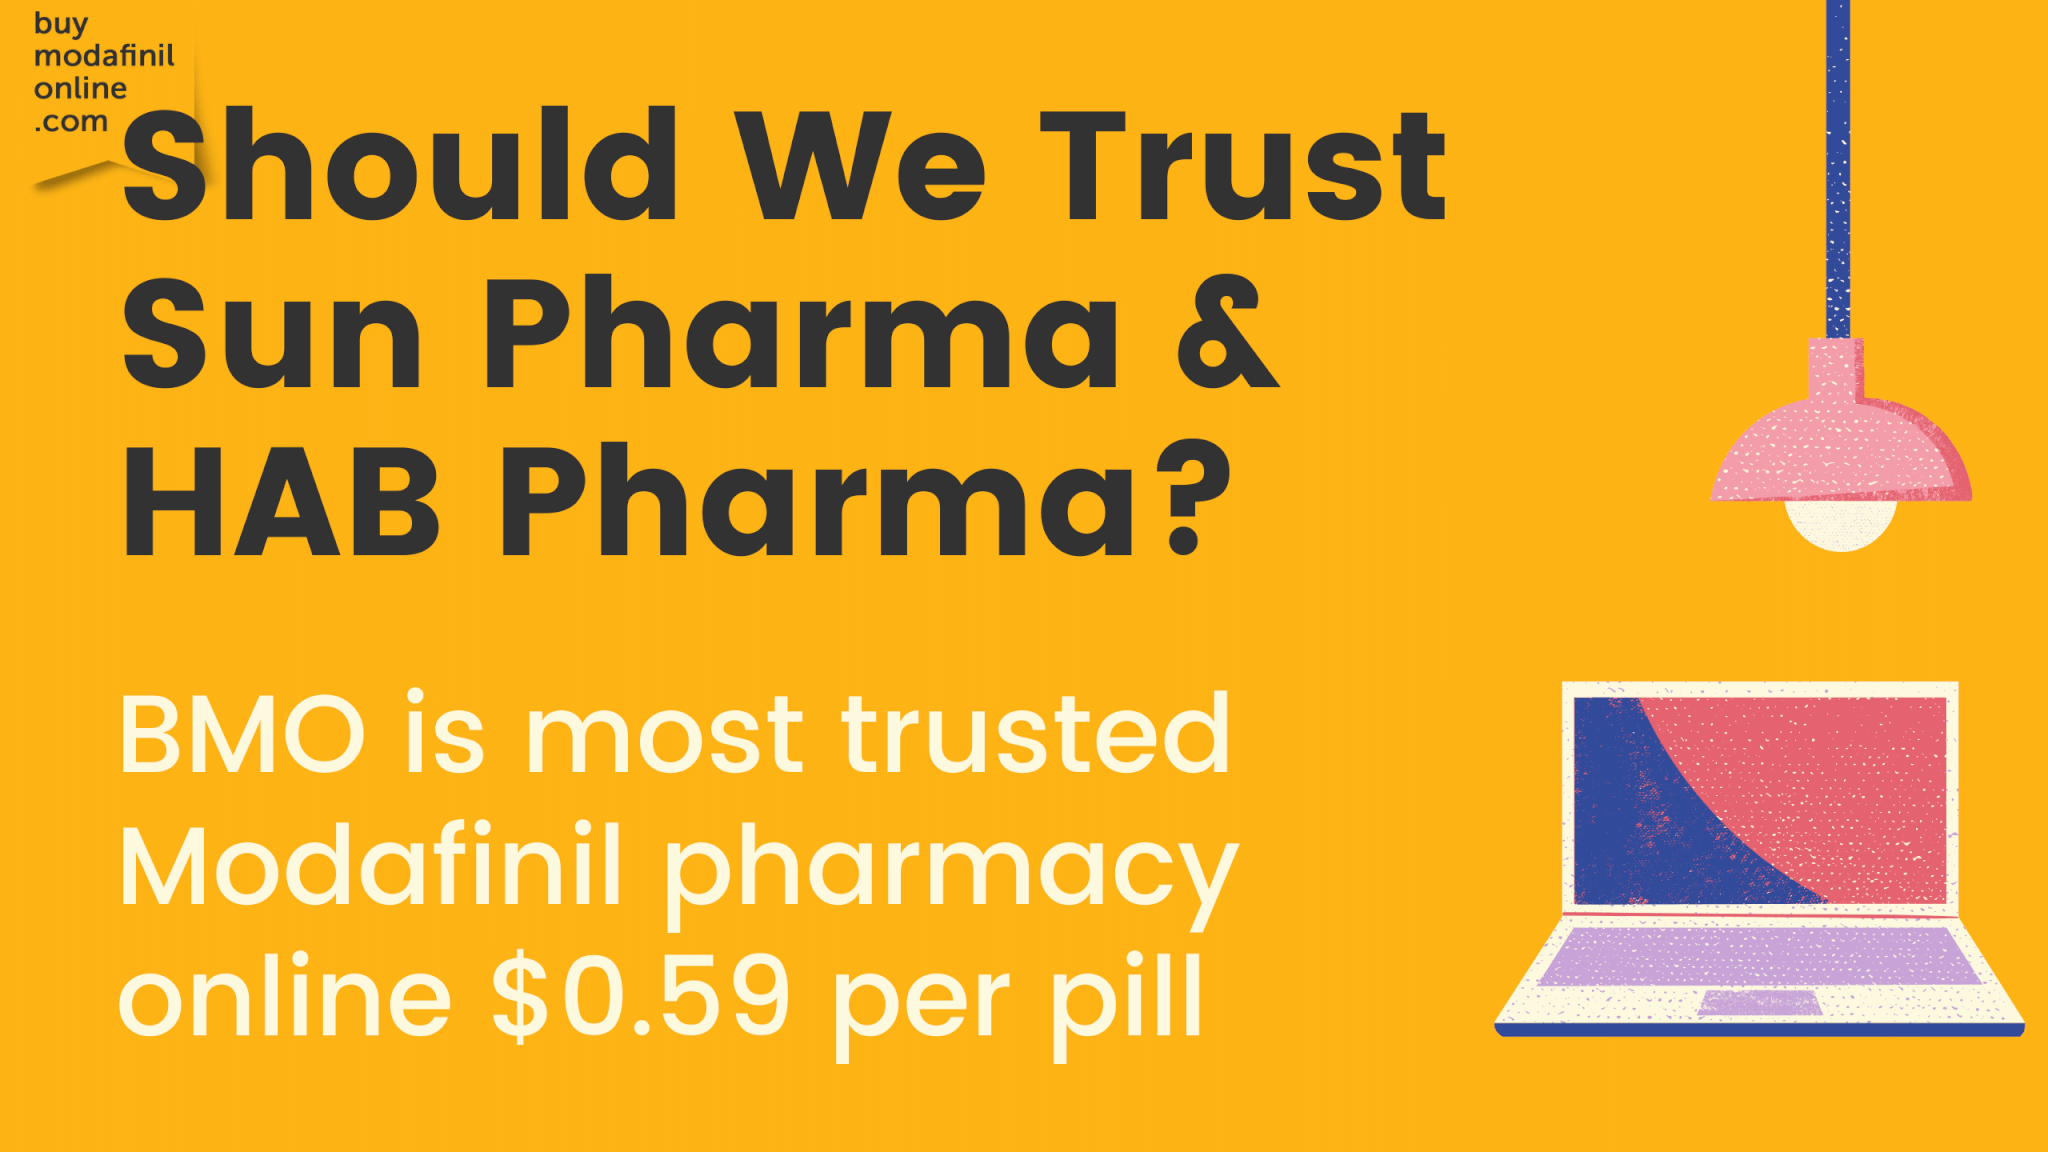 Sun Pharma en HAB Pharma: waarom we ze kunnen vertrouwen